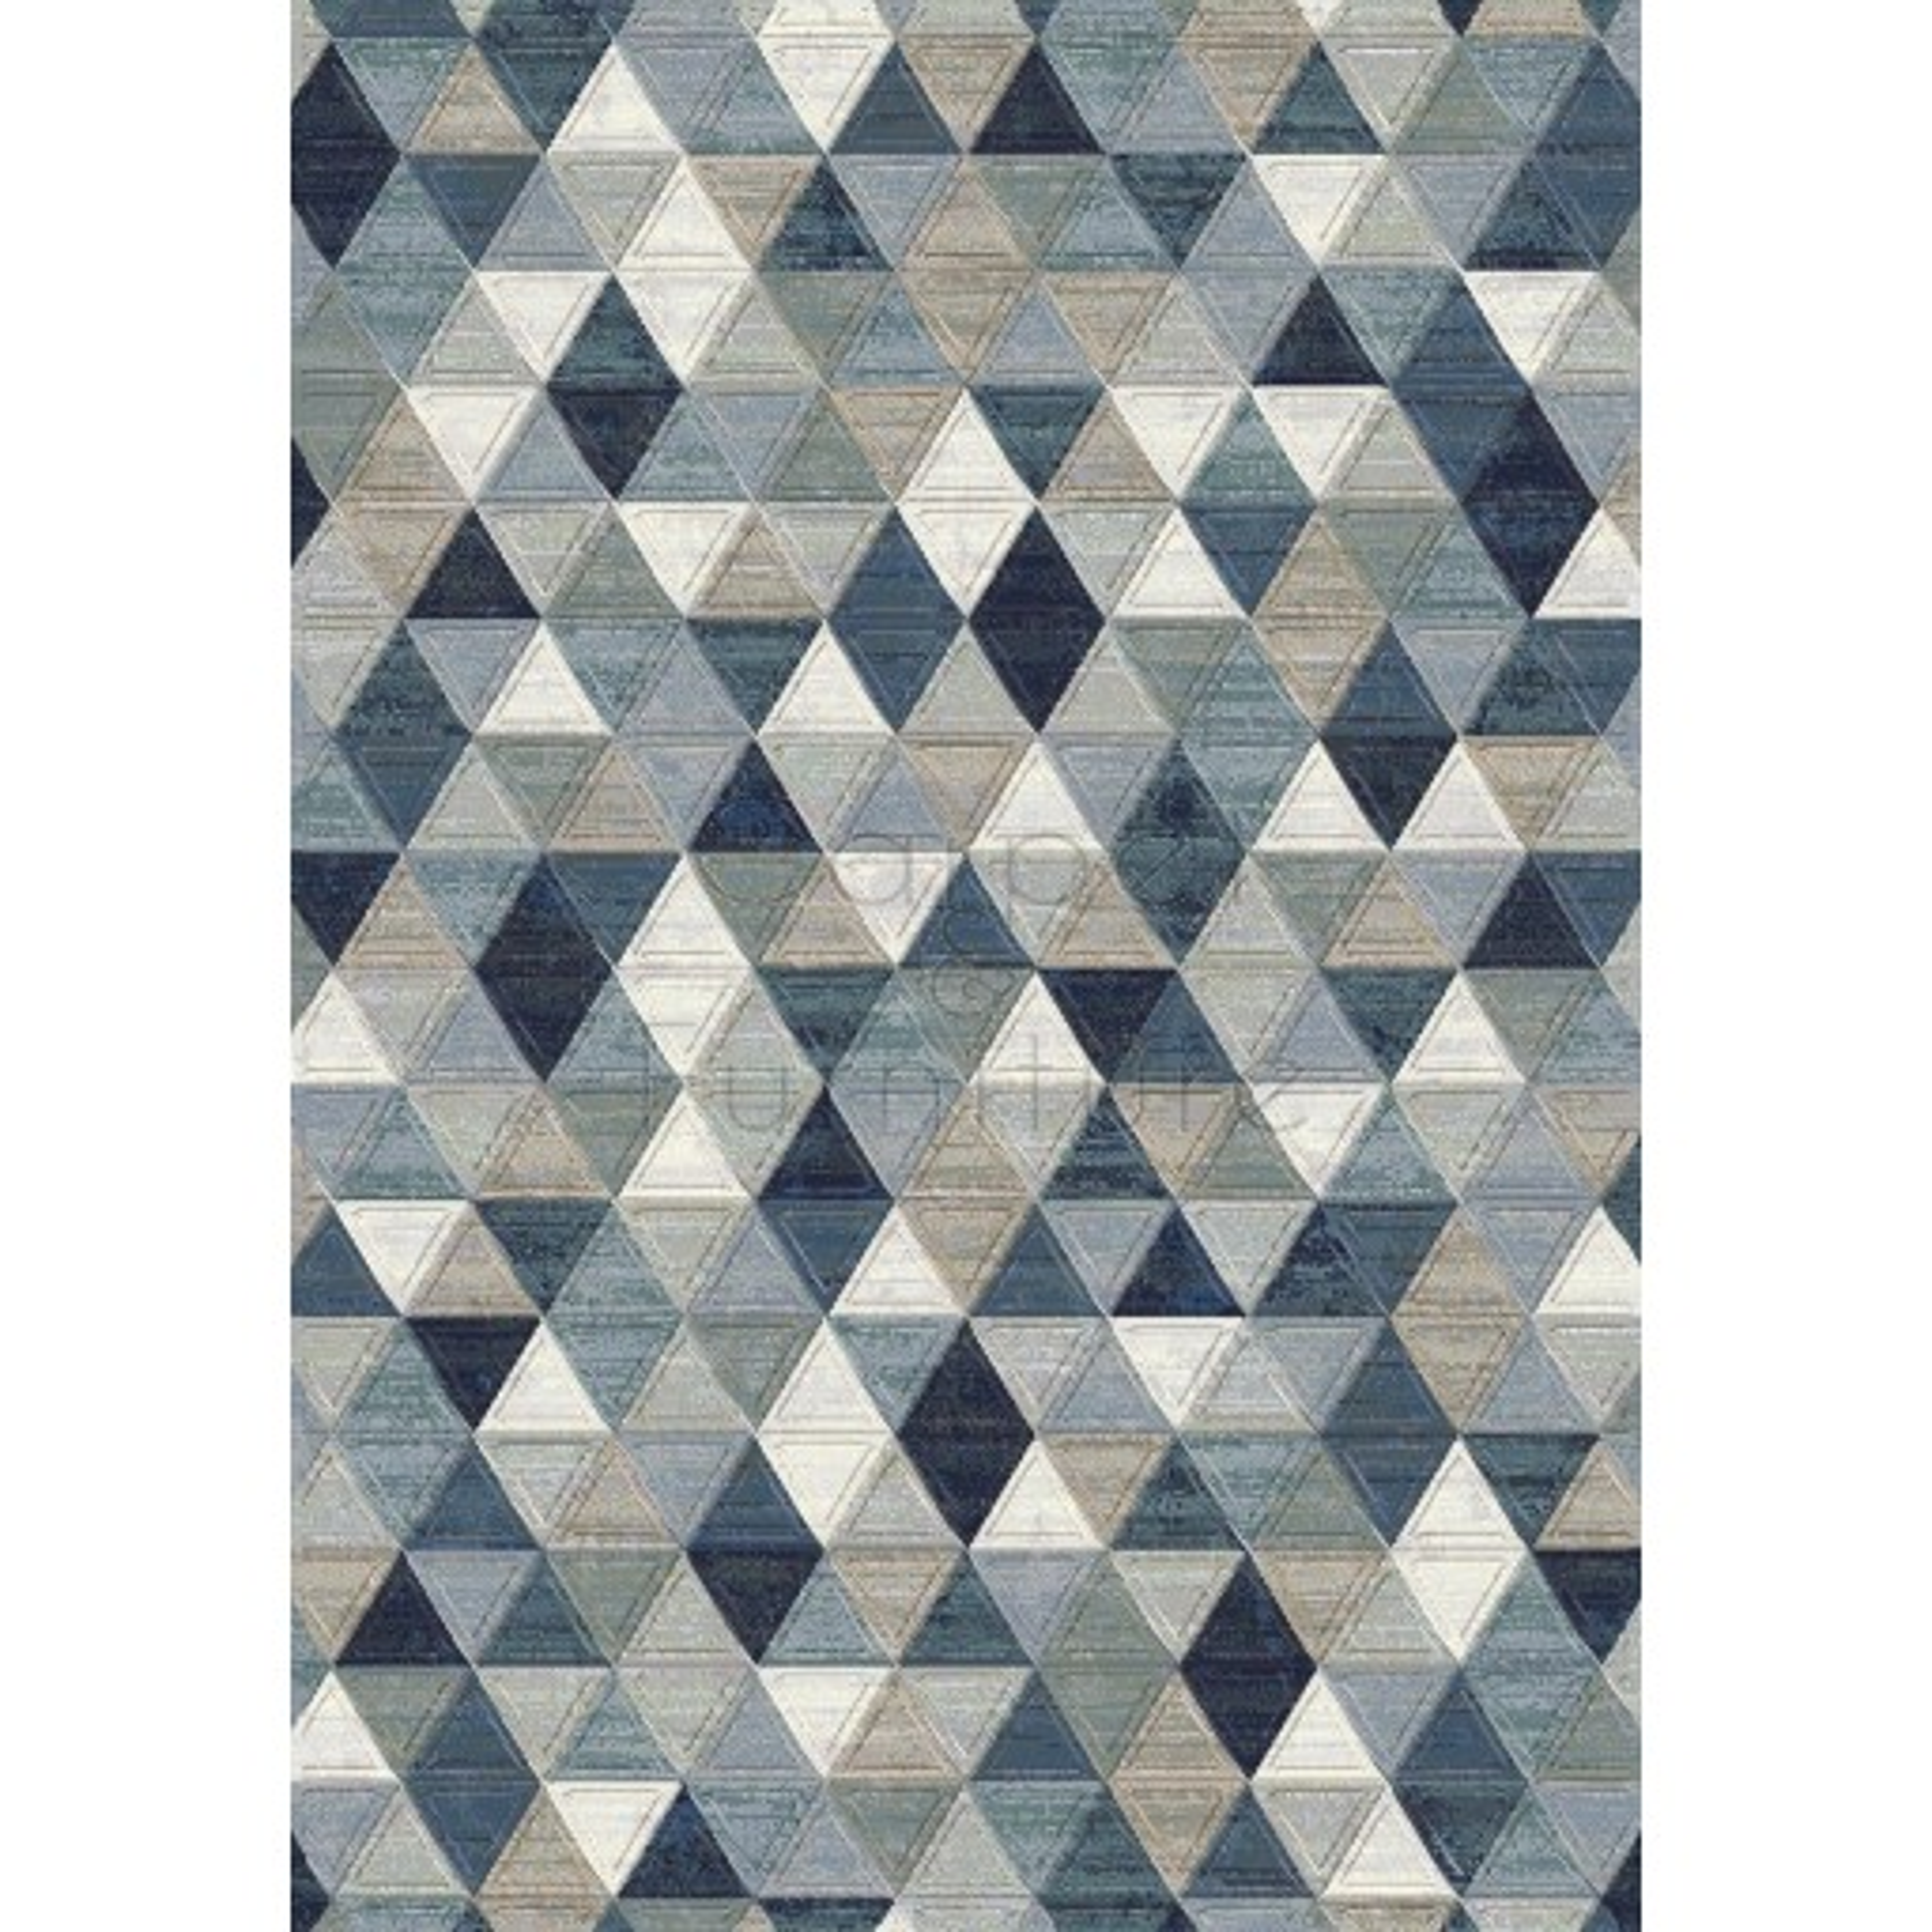 "Galleria Rug - Triangles 63263 5161 - Size 80 x 150 cm (2'8"" x 5')"